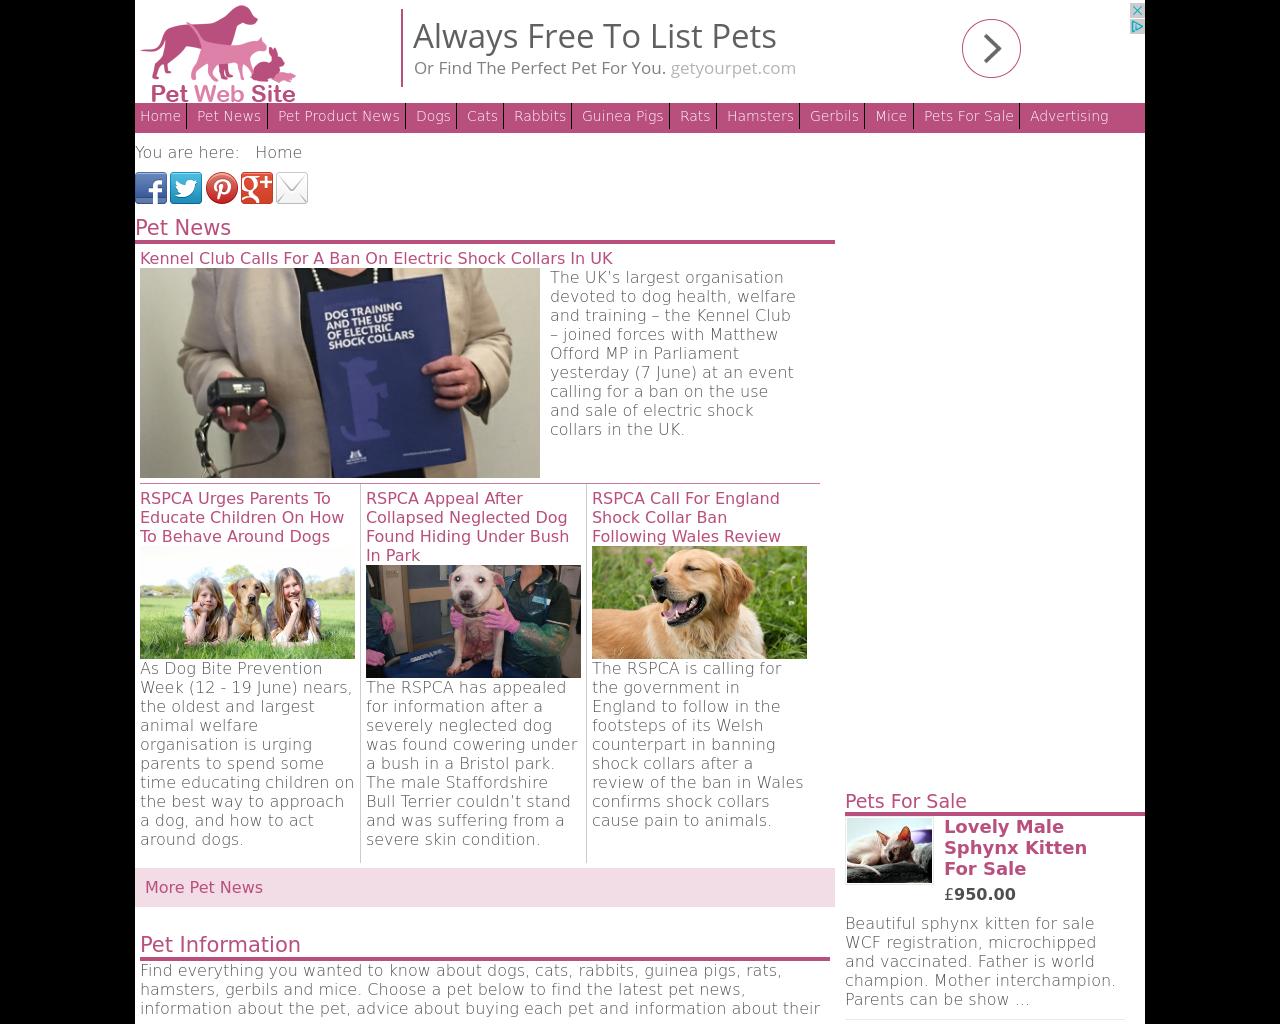 Pet-Web-Site-Advertising-Reviews-Pricing